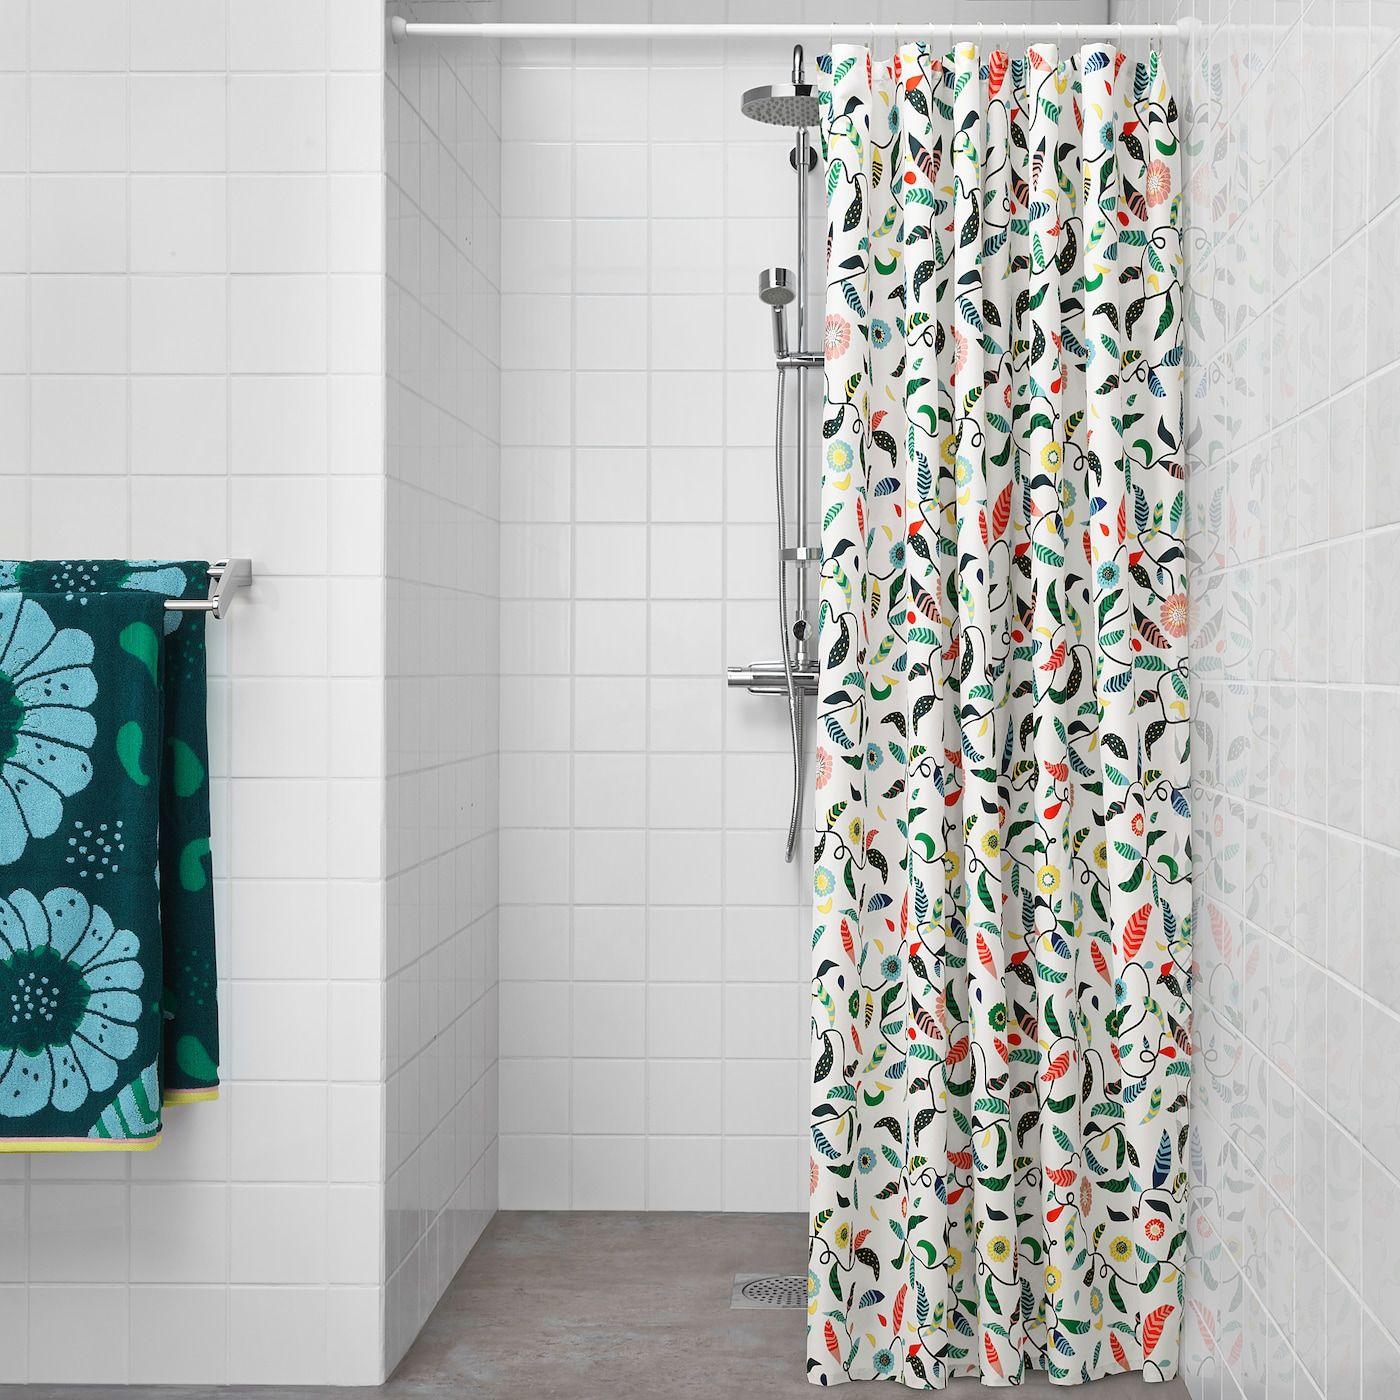 Sandbredan Shower Curtain Multicolor 71x71 180x180 Cm In